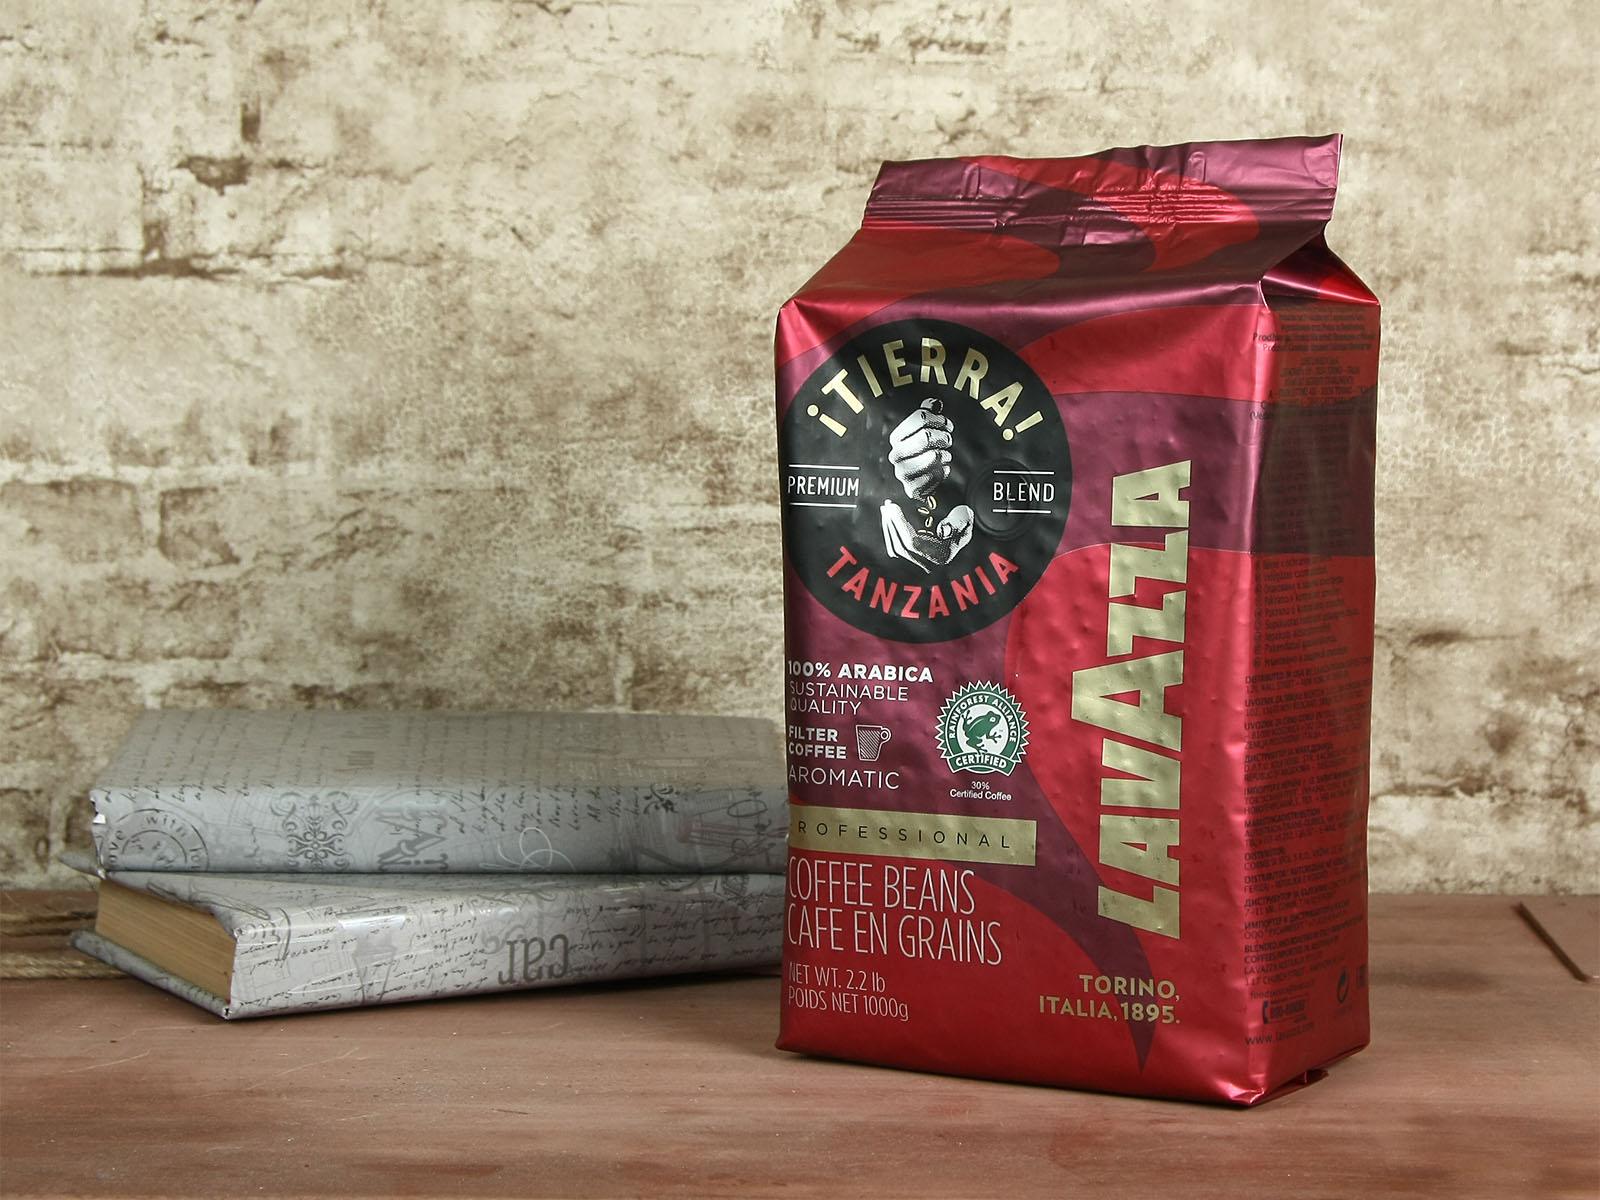 Кофе в зернах Tierra Tanzania Blend Aromatic Arabica 100%, 1000г., арабика Lavazza - фото 1